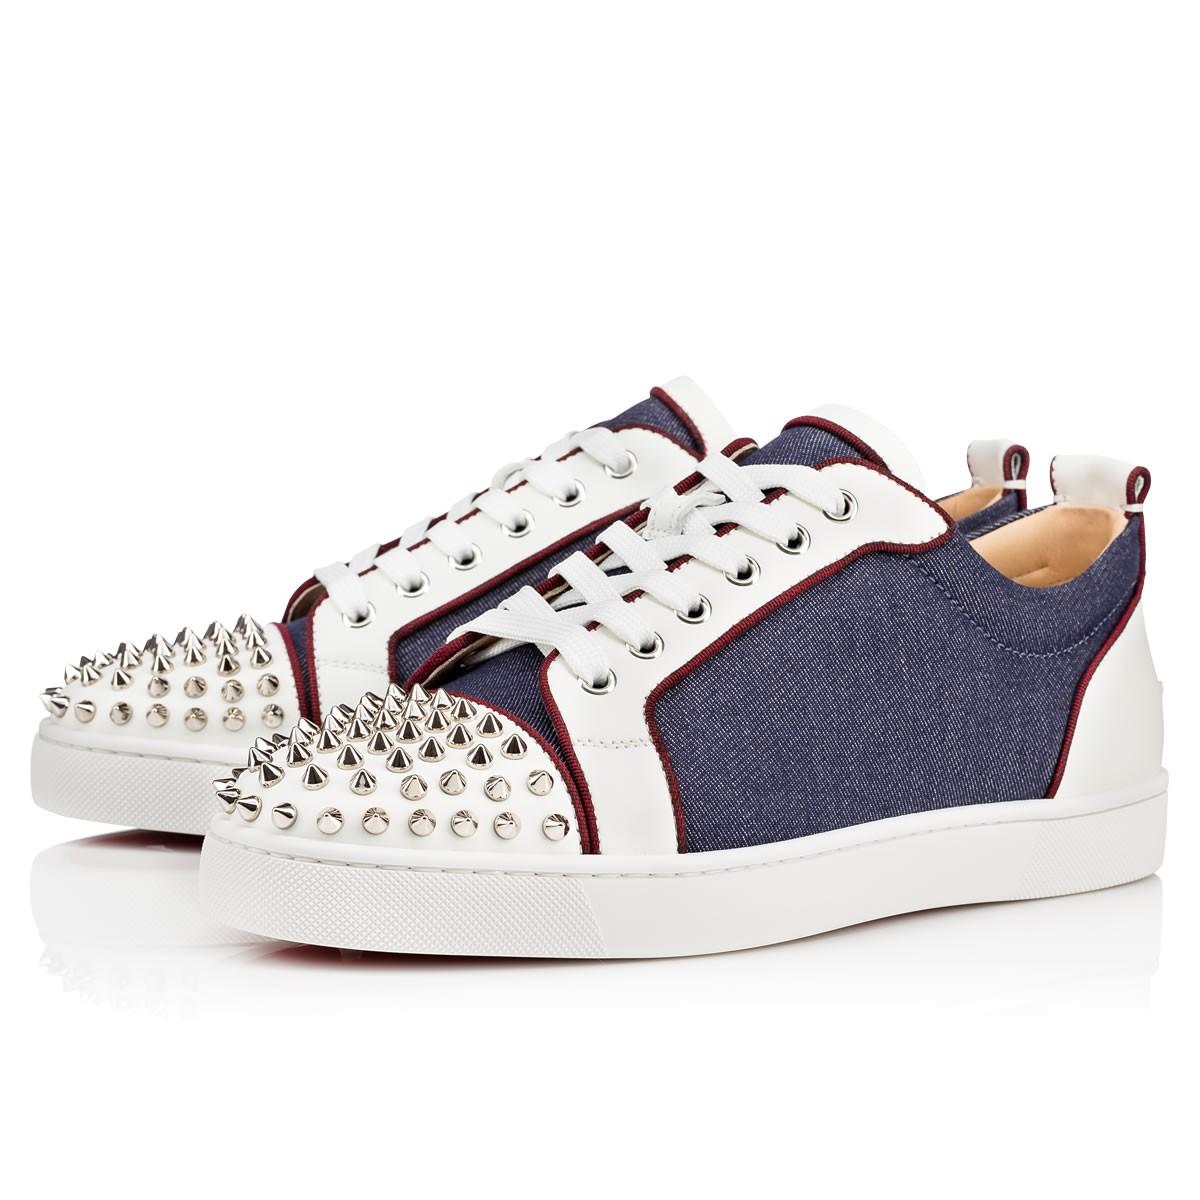 2760052103a7 Christian Louboutin Louis Junior Spikes Orlato Men s Flat Version  Blue Silver Leather - Men Shoes